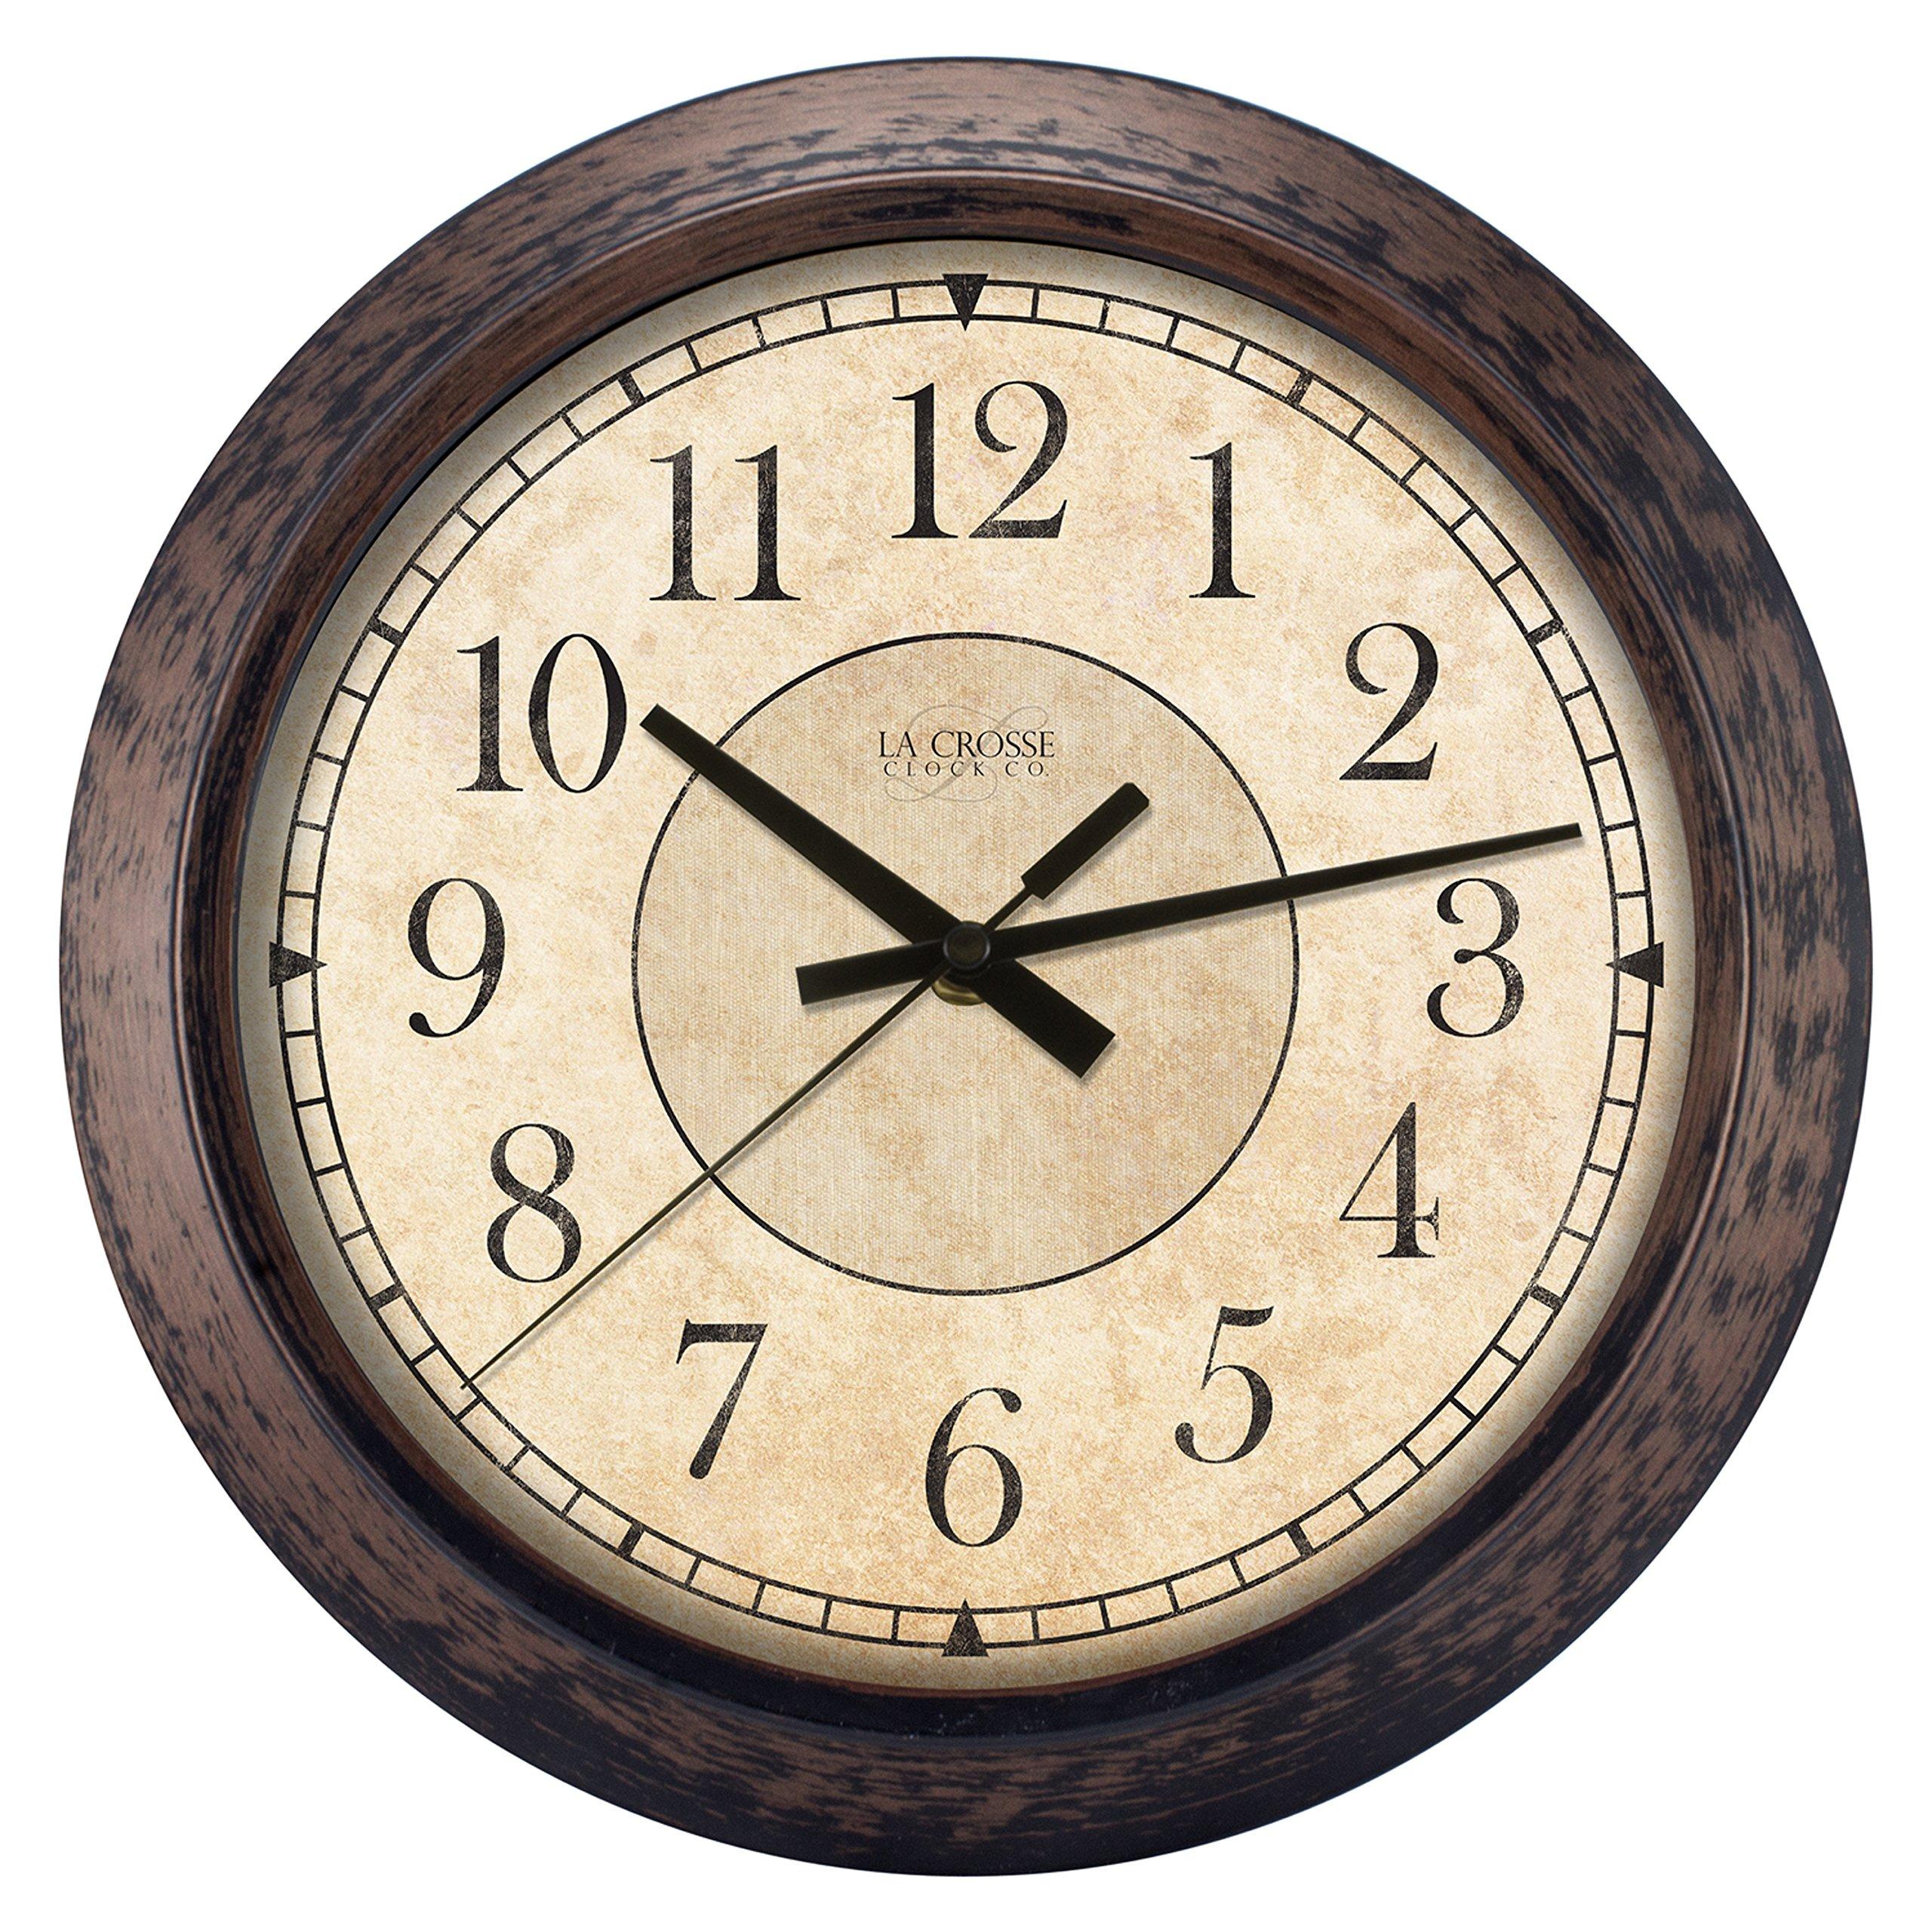 Lacrosse 404-2635 Analog Wall Clock, 14'', Rustic Brown